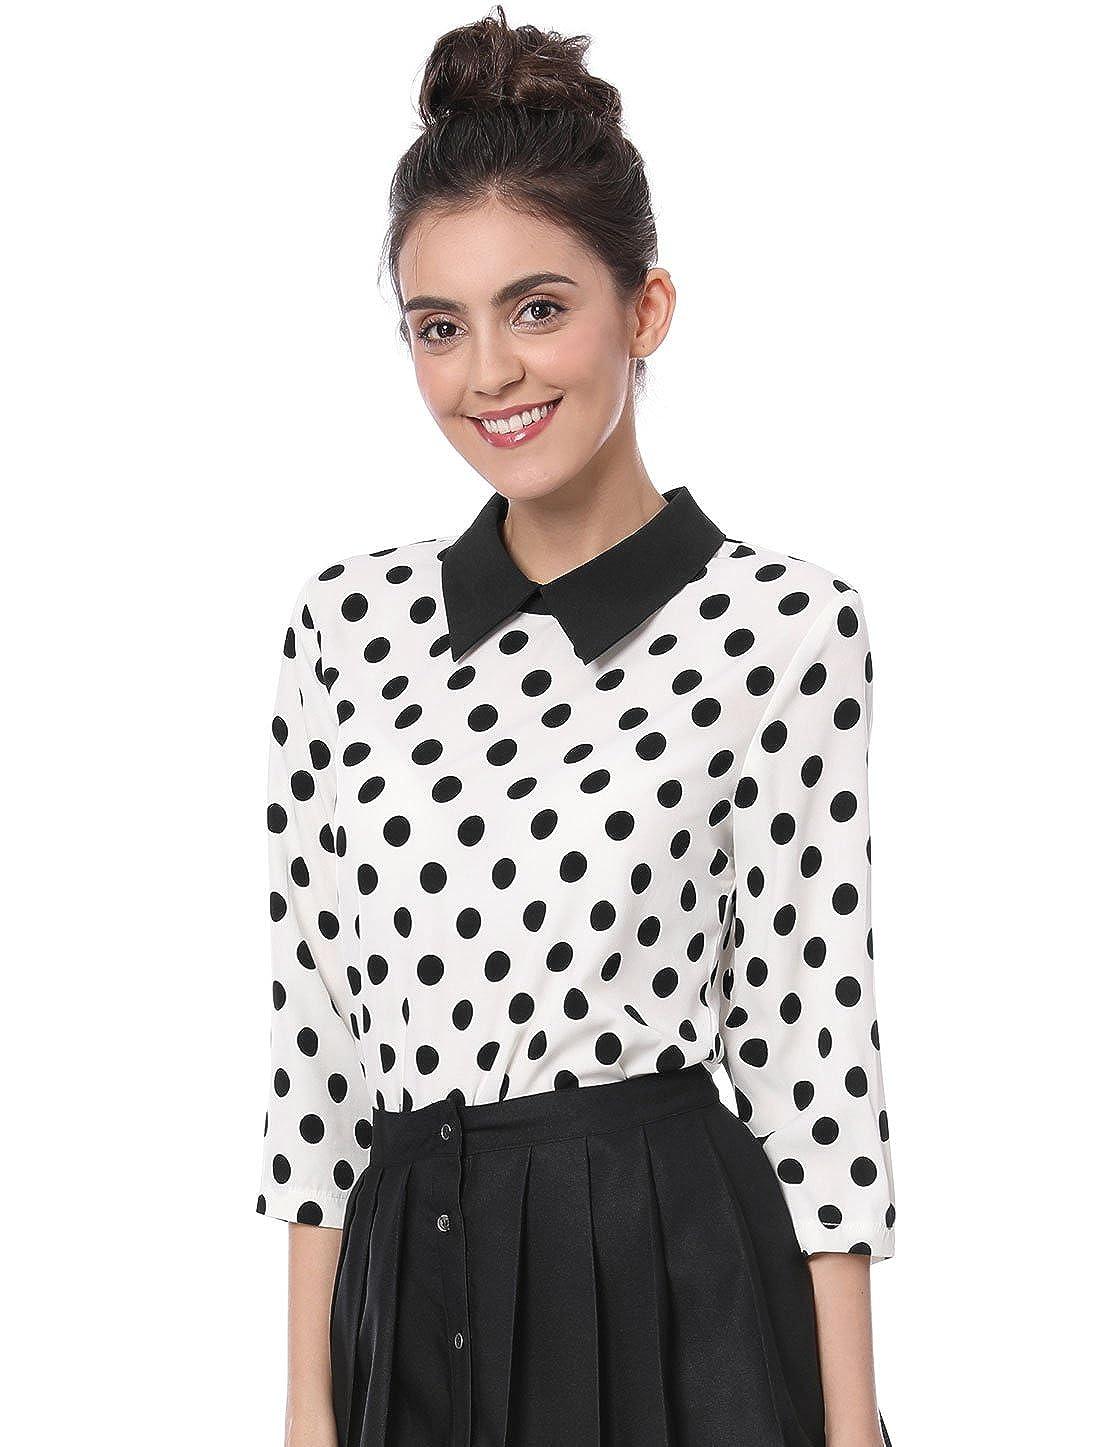 Allegra K Women 3/4 Sleeves Contrast Collar Polka Dots Blouse g18031300ux0001